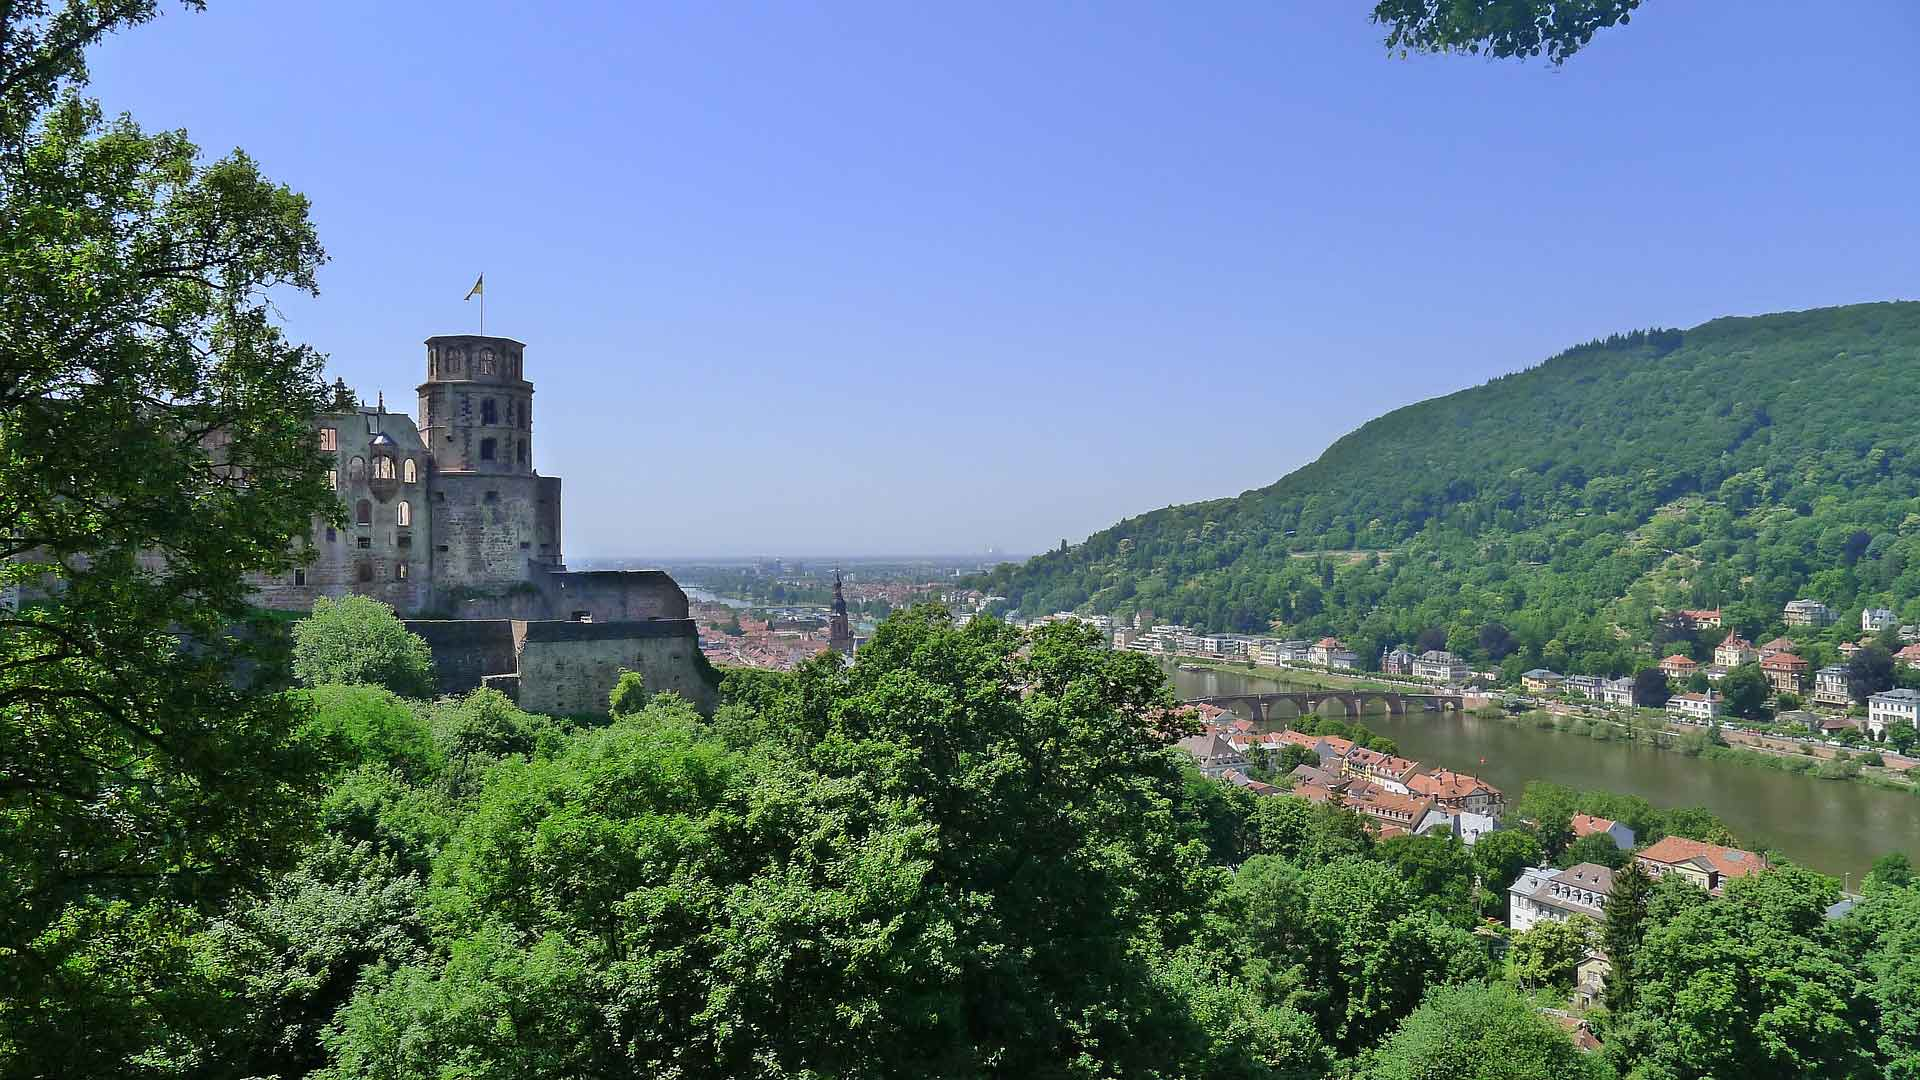 De Neckar bij Heidelberg.